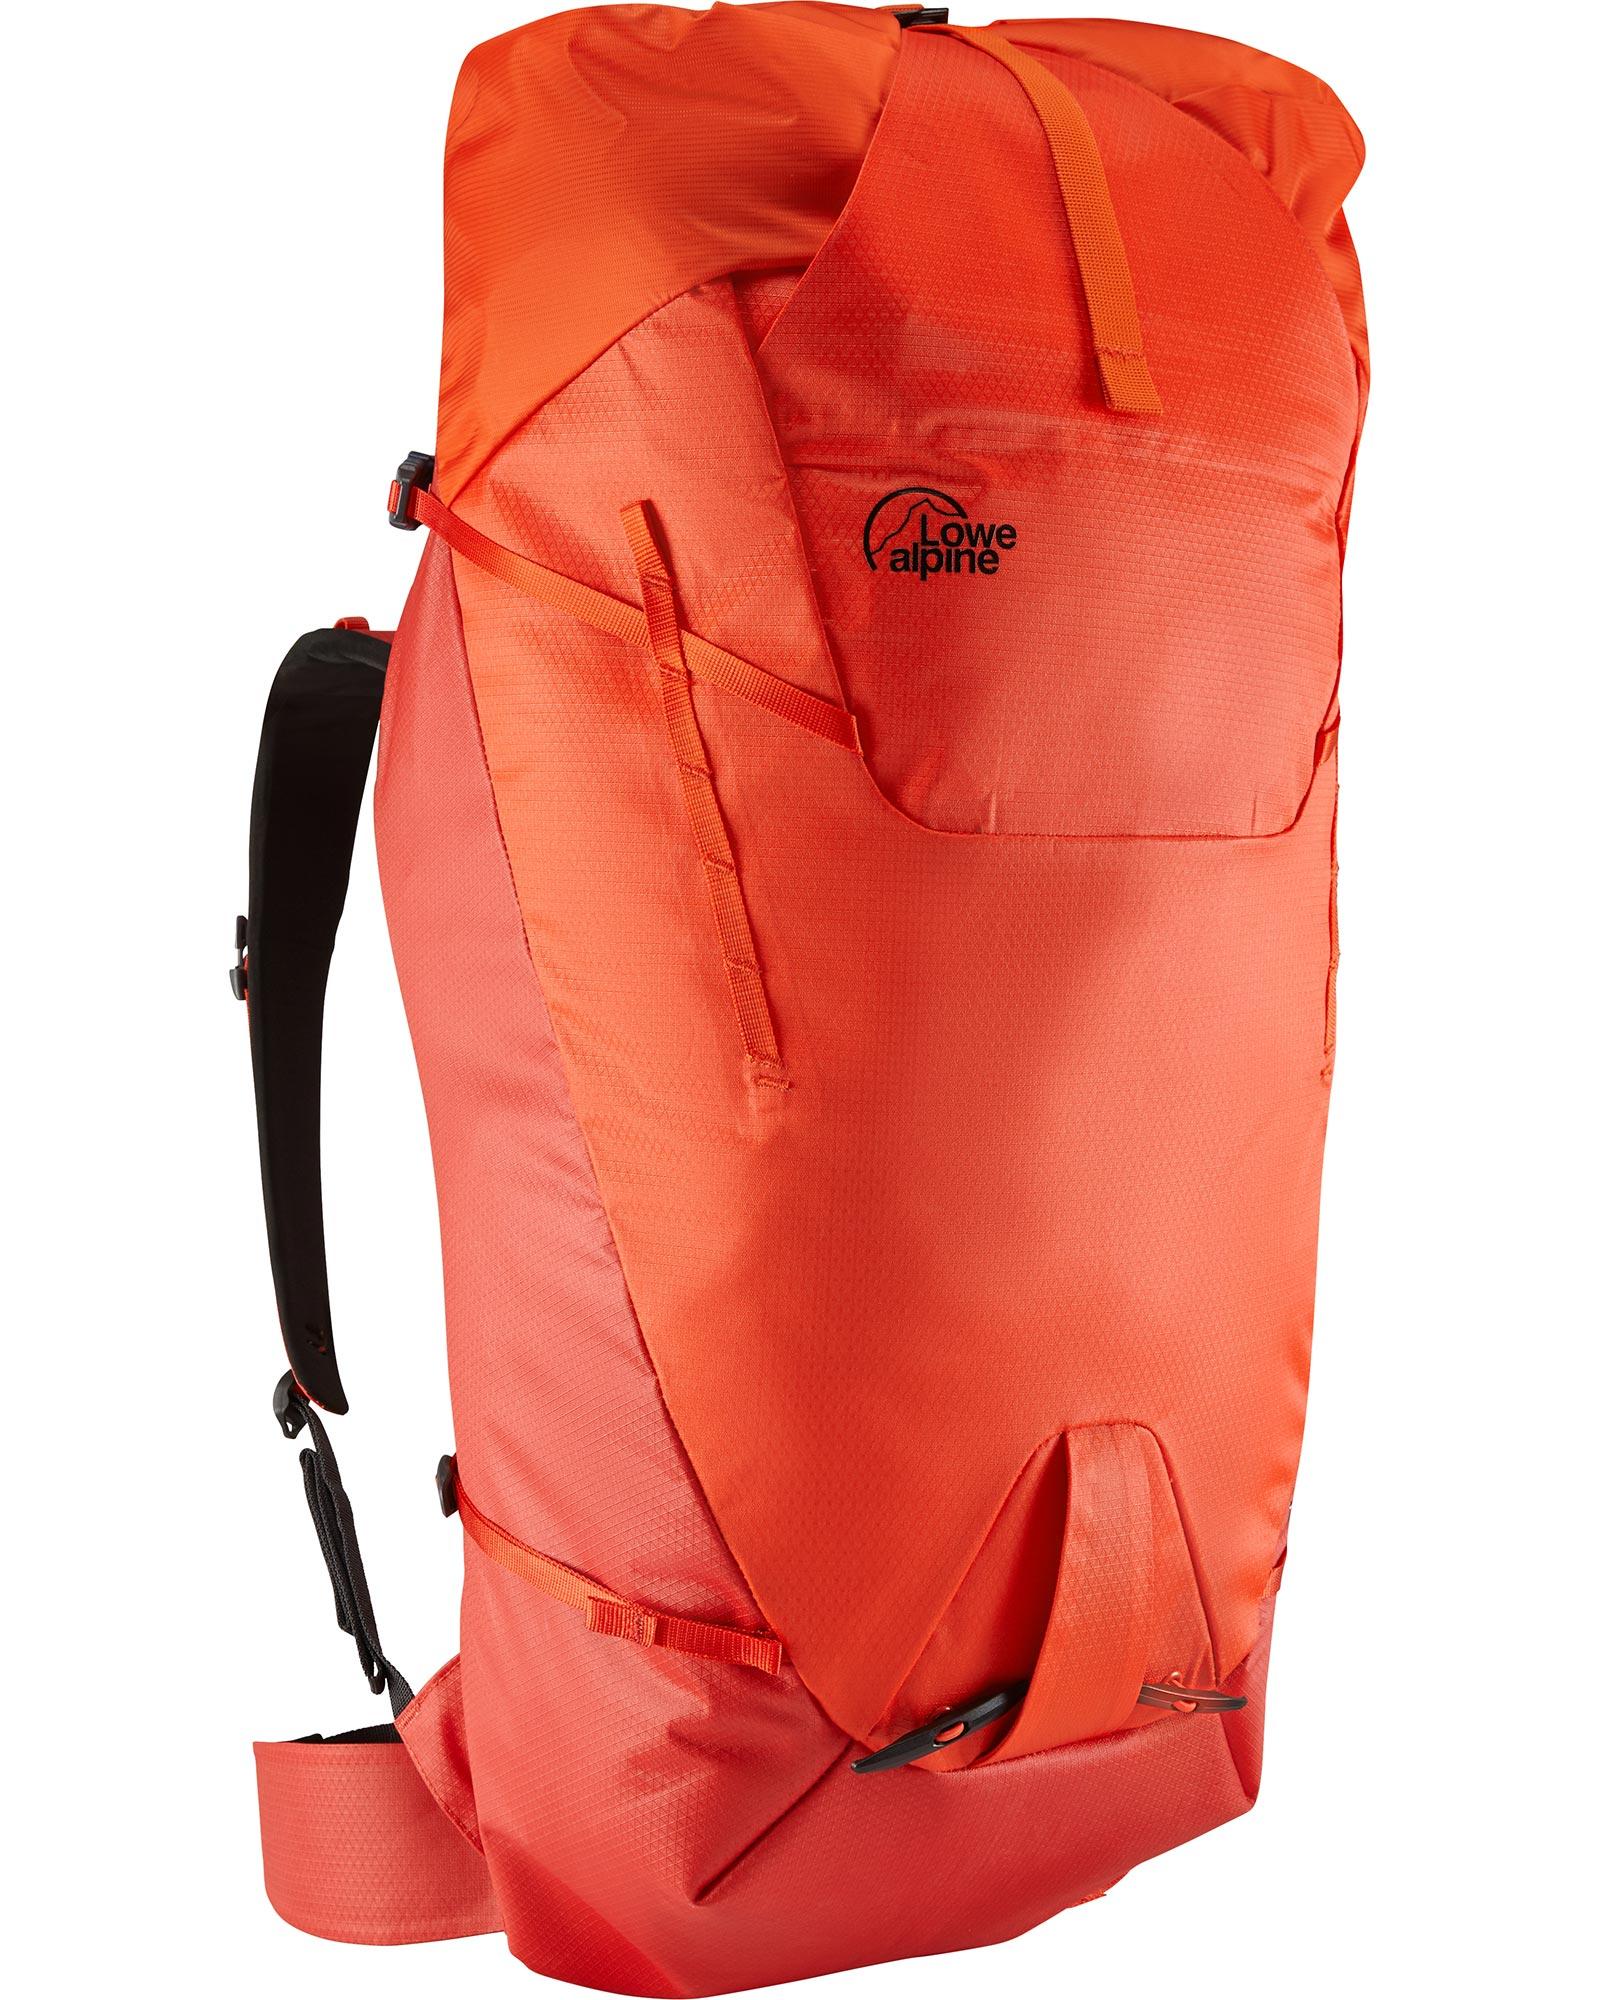 Lowe Alpine Uprise 40:50 Backpack 0